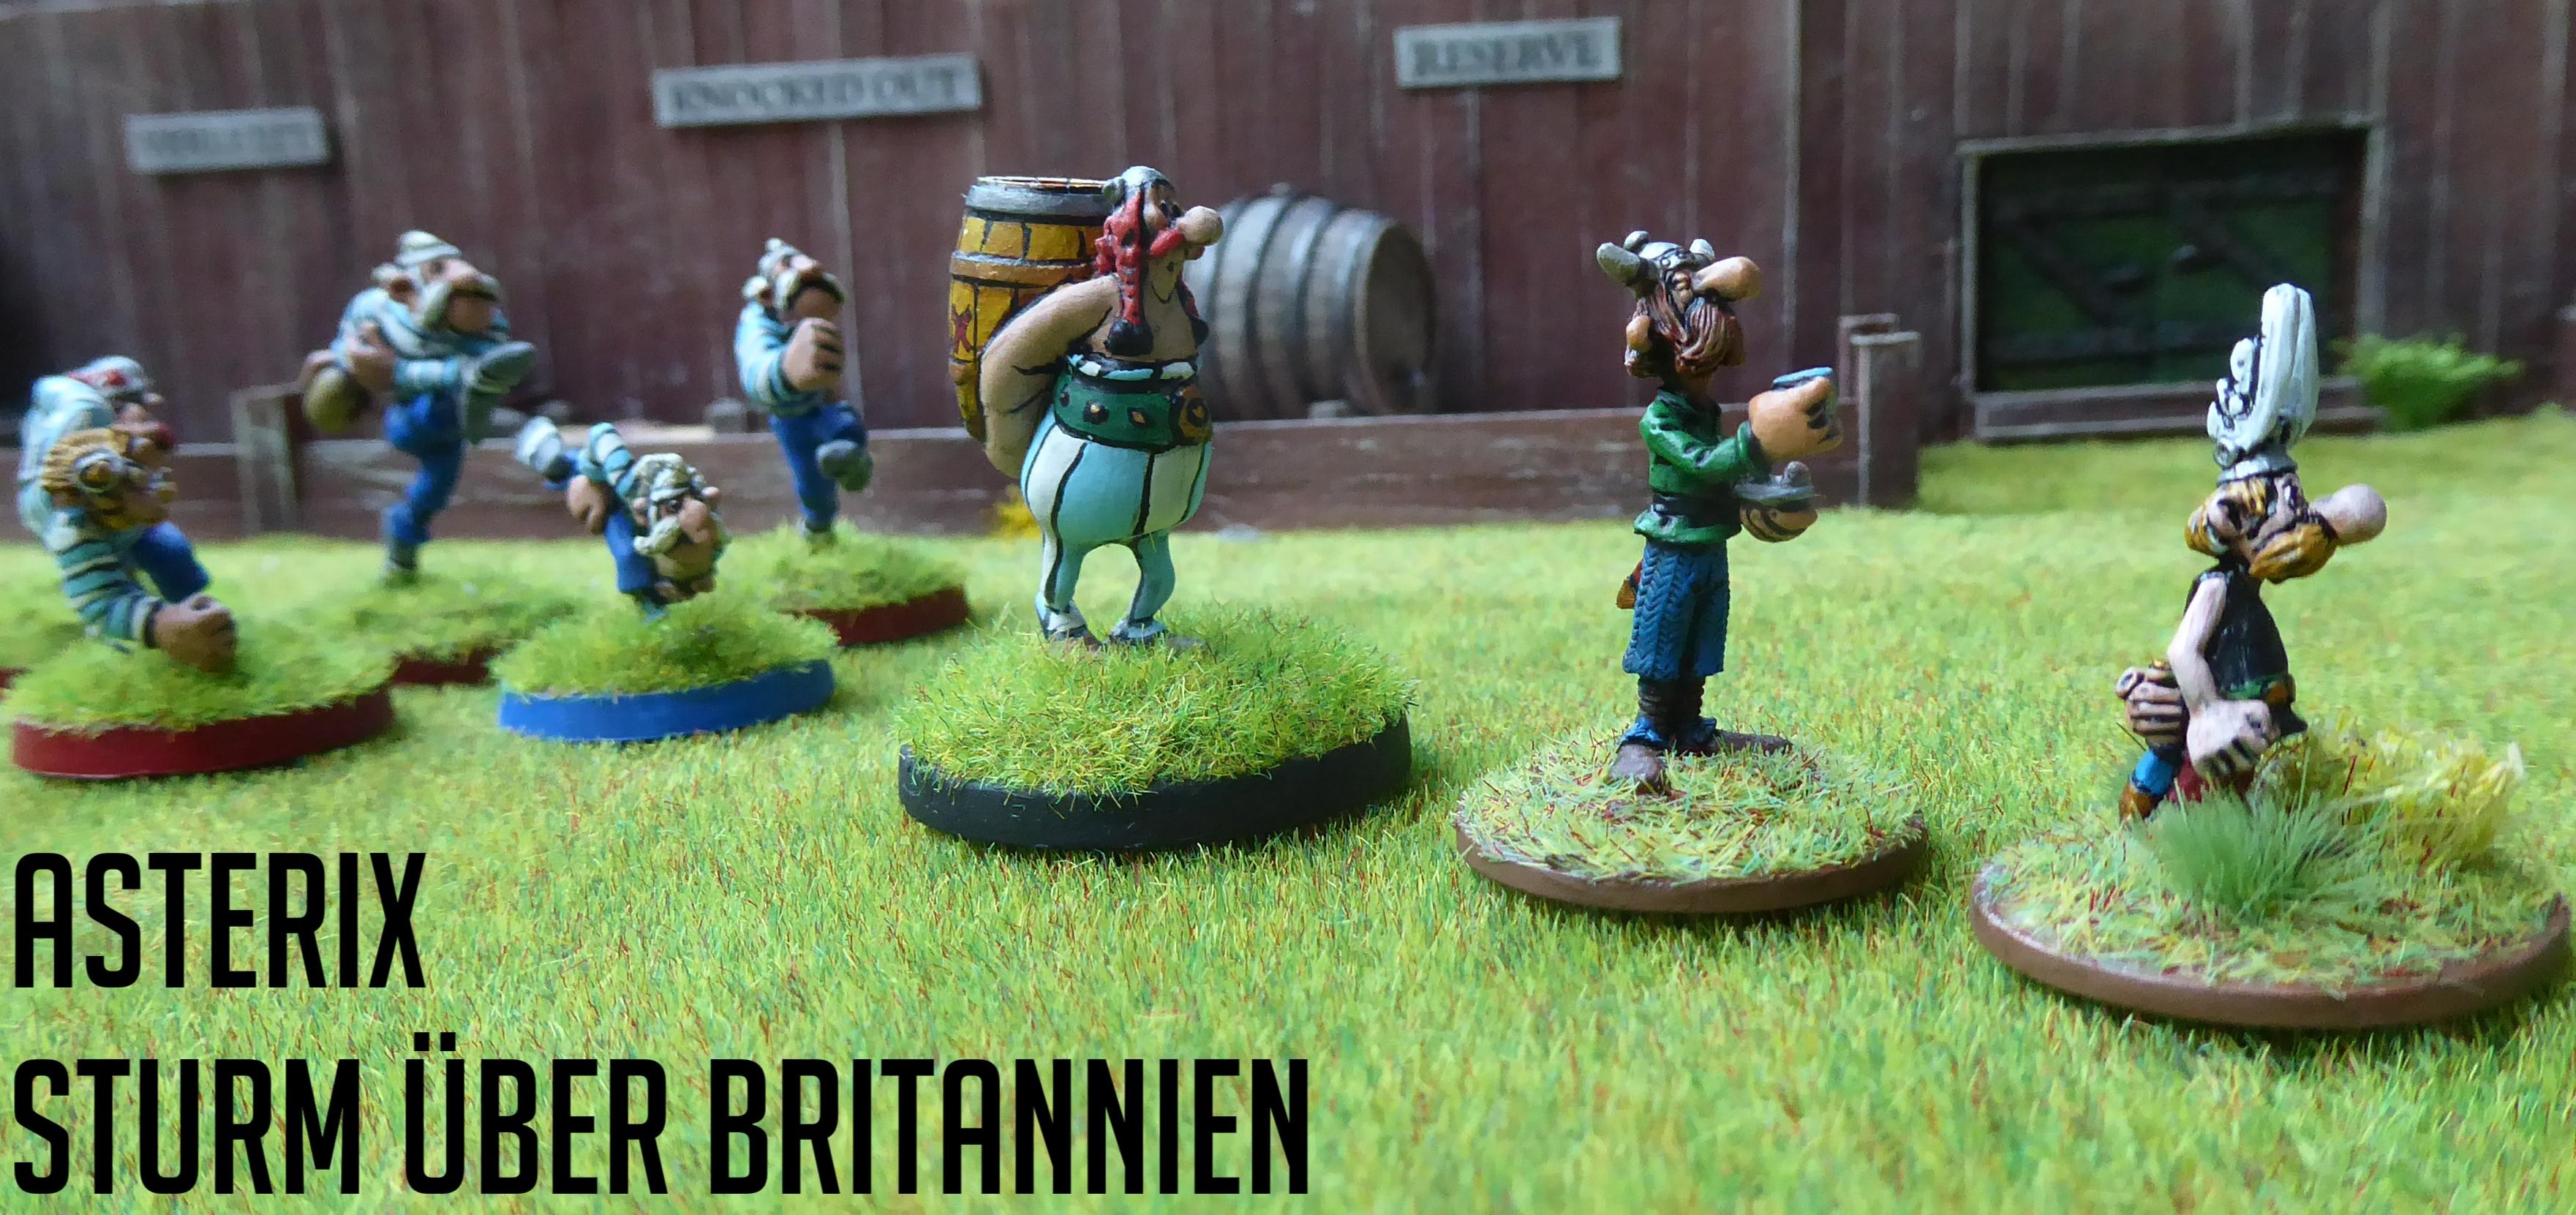 Asterix-Britannien-2